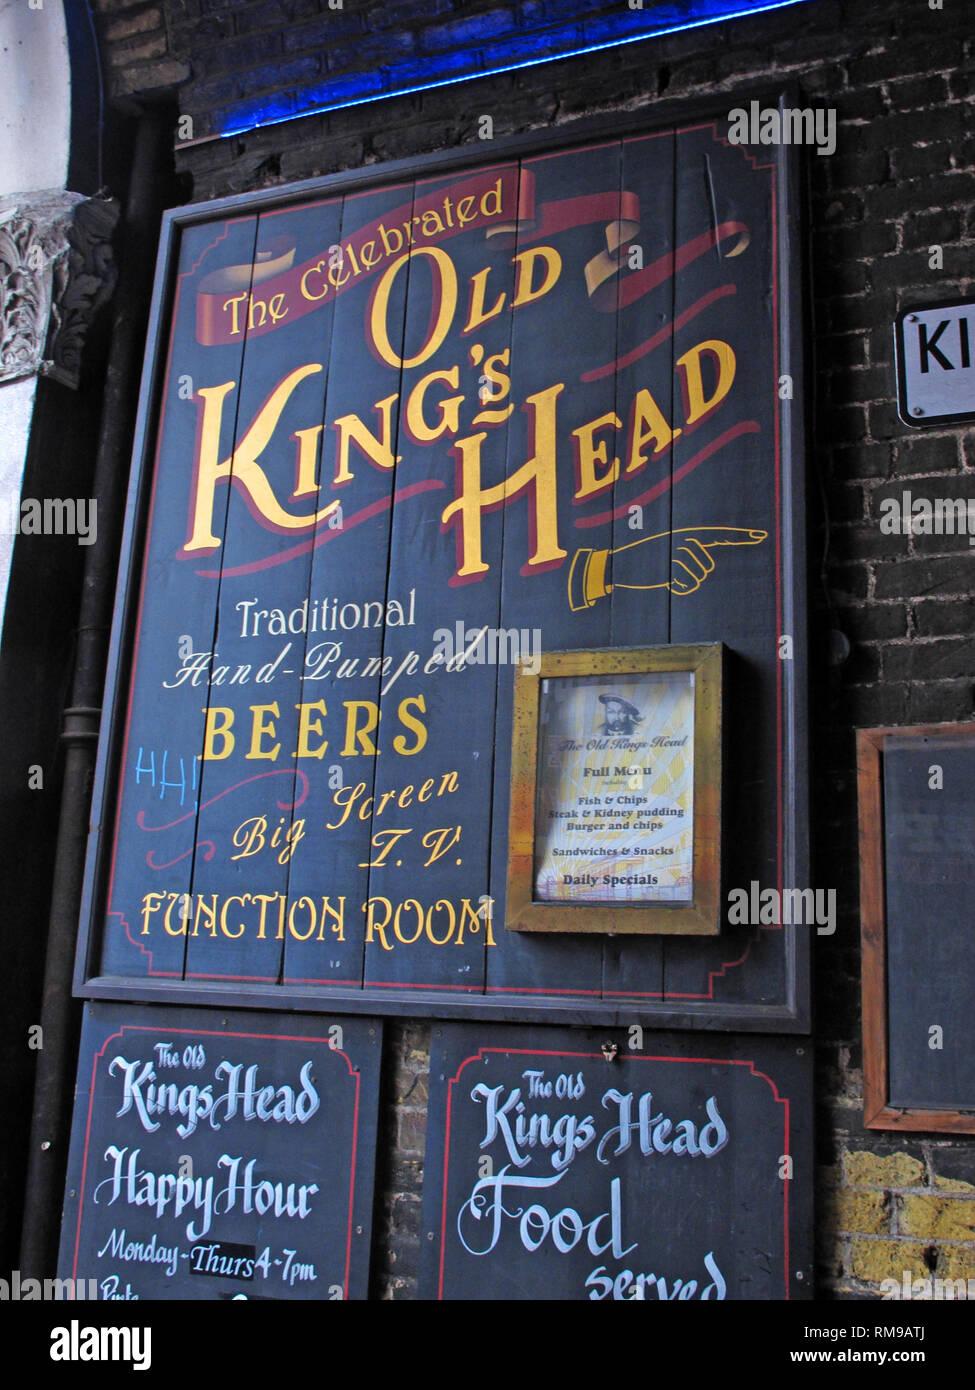 Old Kings Head Pub, Southwark - King's Head Yard, Greater London, South East England, UK,  SE1 1NA Stock Photo